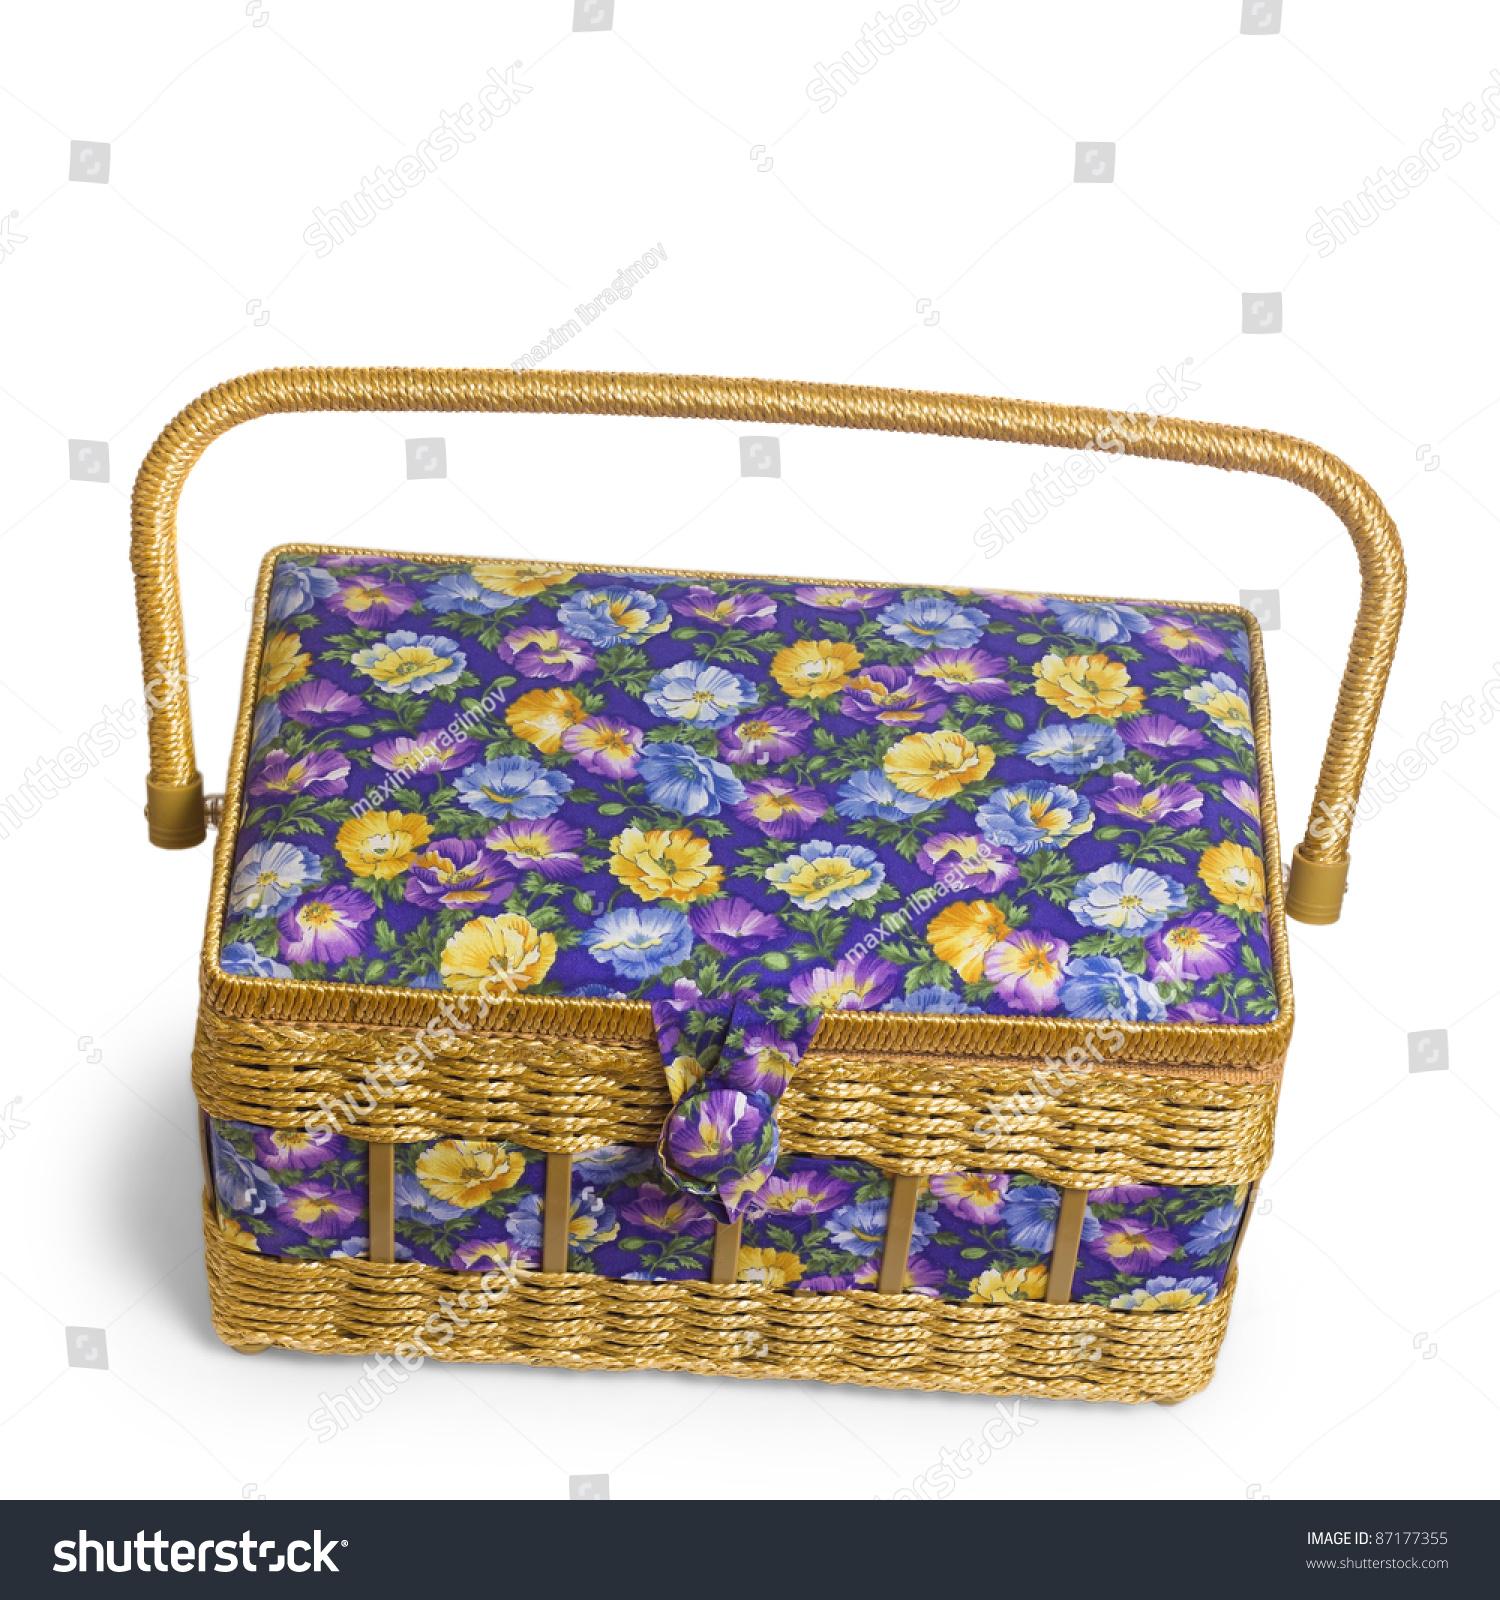 Woven Basket Casket : Vintage wicker basket casket isolated on stock photo